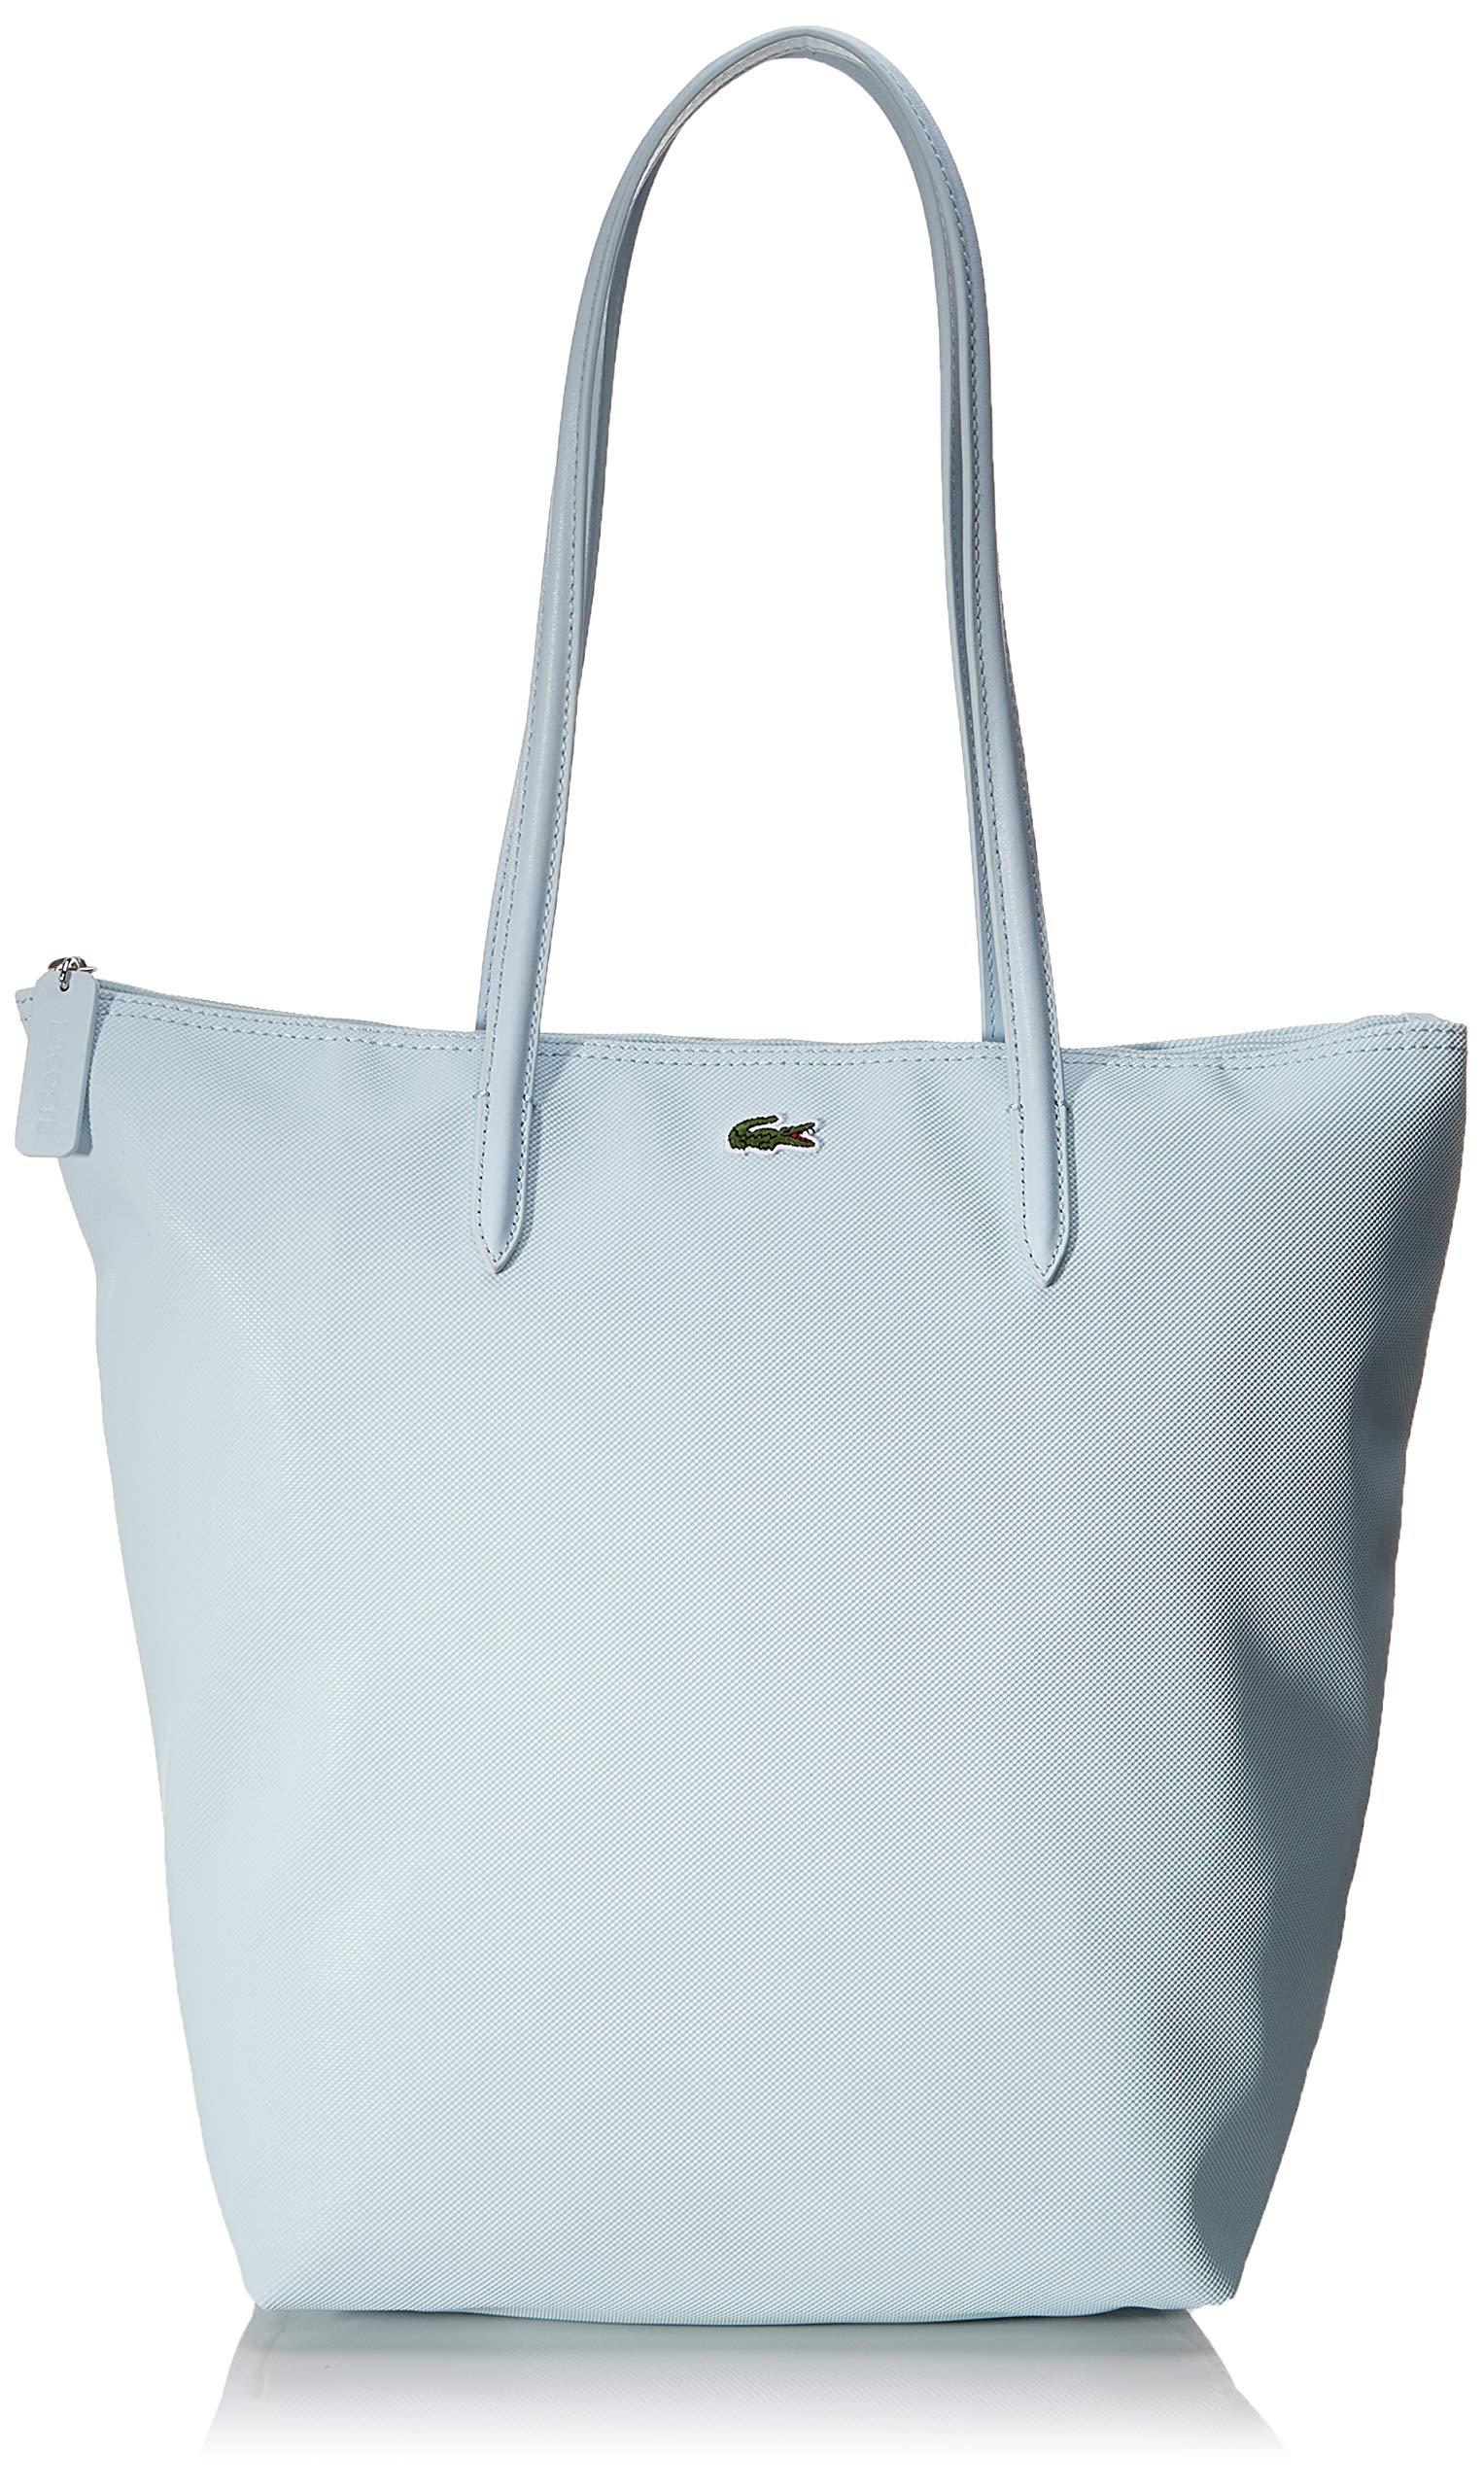 Lacoste - L.12.12 Concept, Shoppers y bolsos de hombro Mujer, Azul (Illusion Blue), 15.5x35x25.5 cm (W x H L)